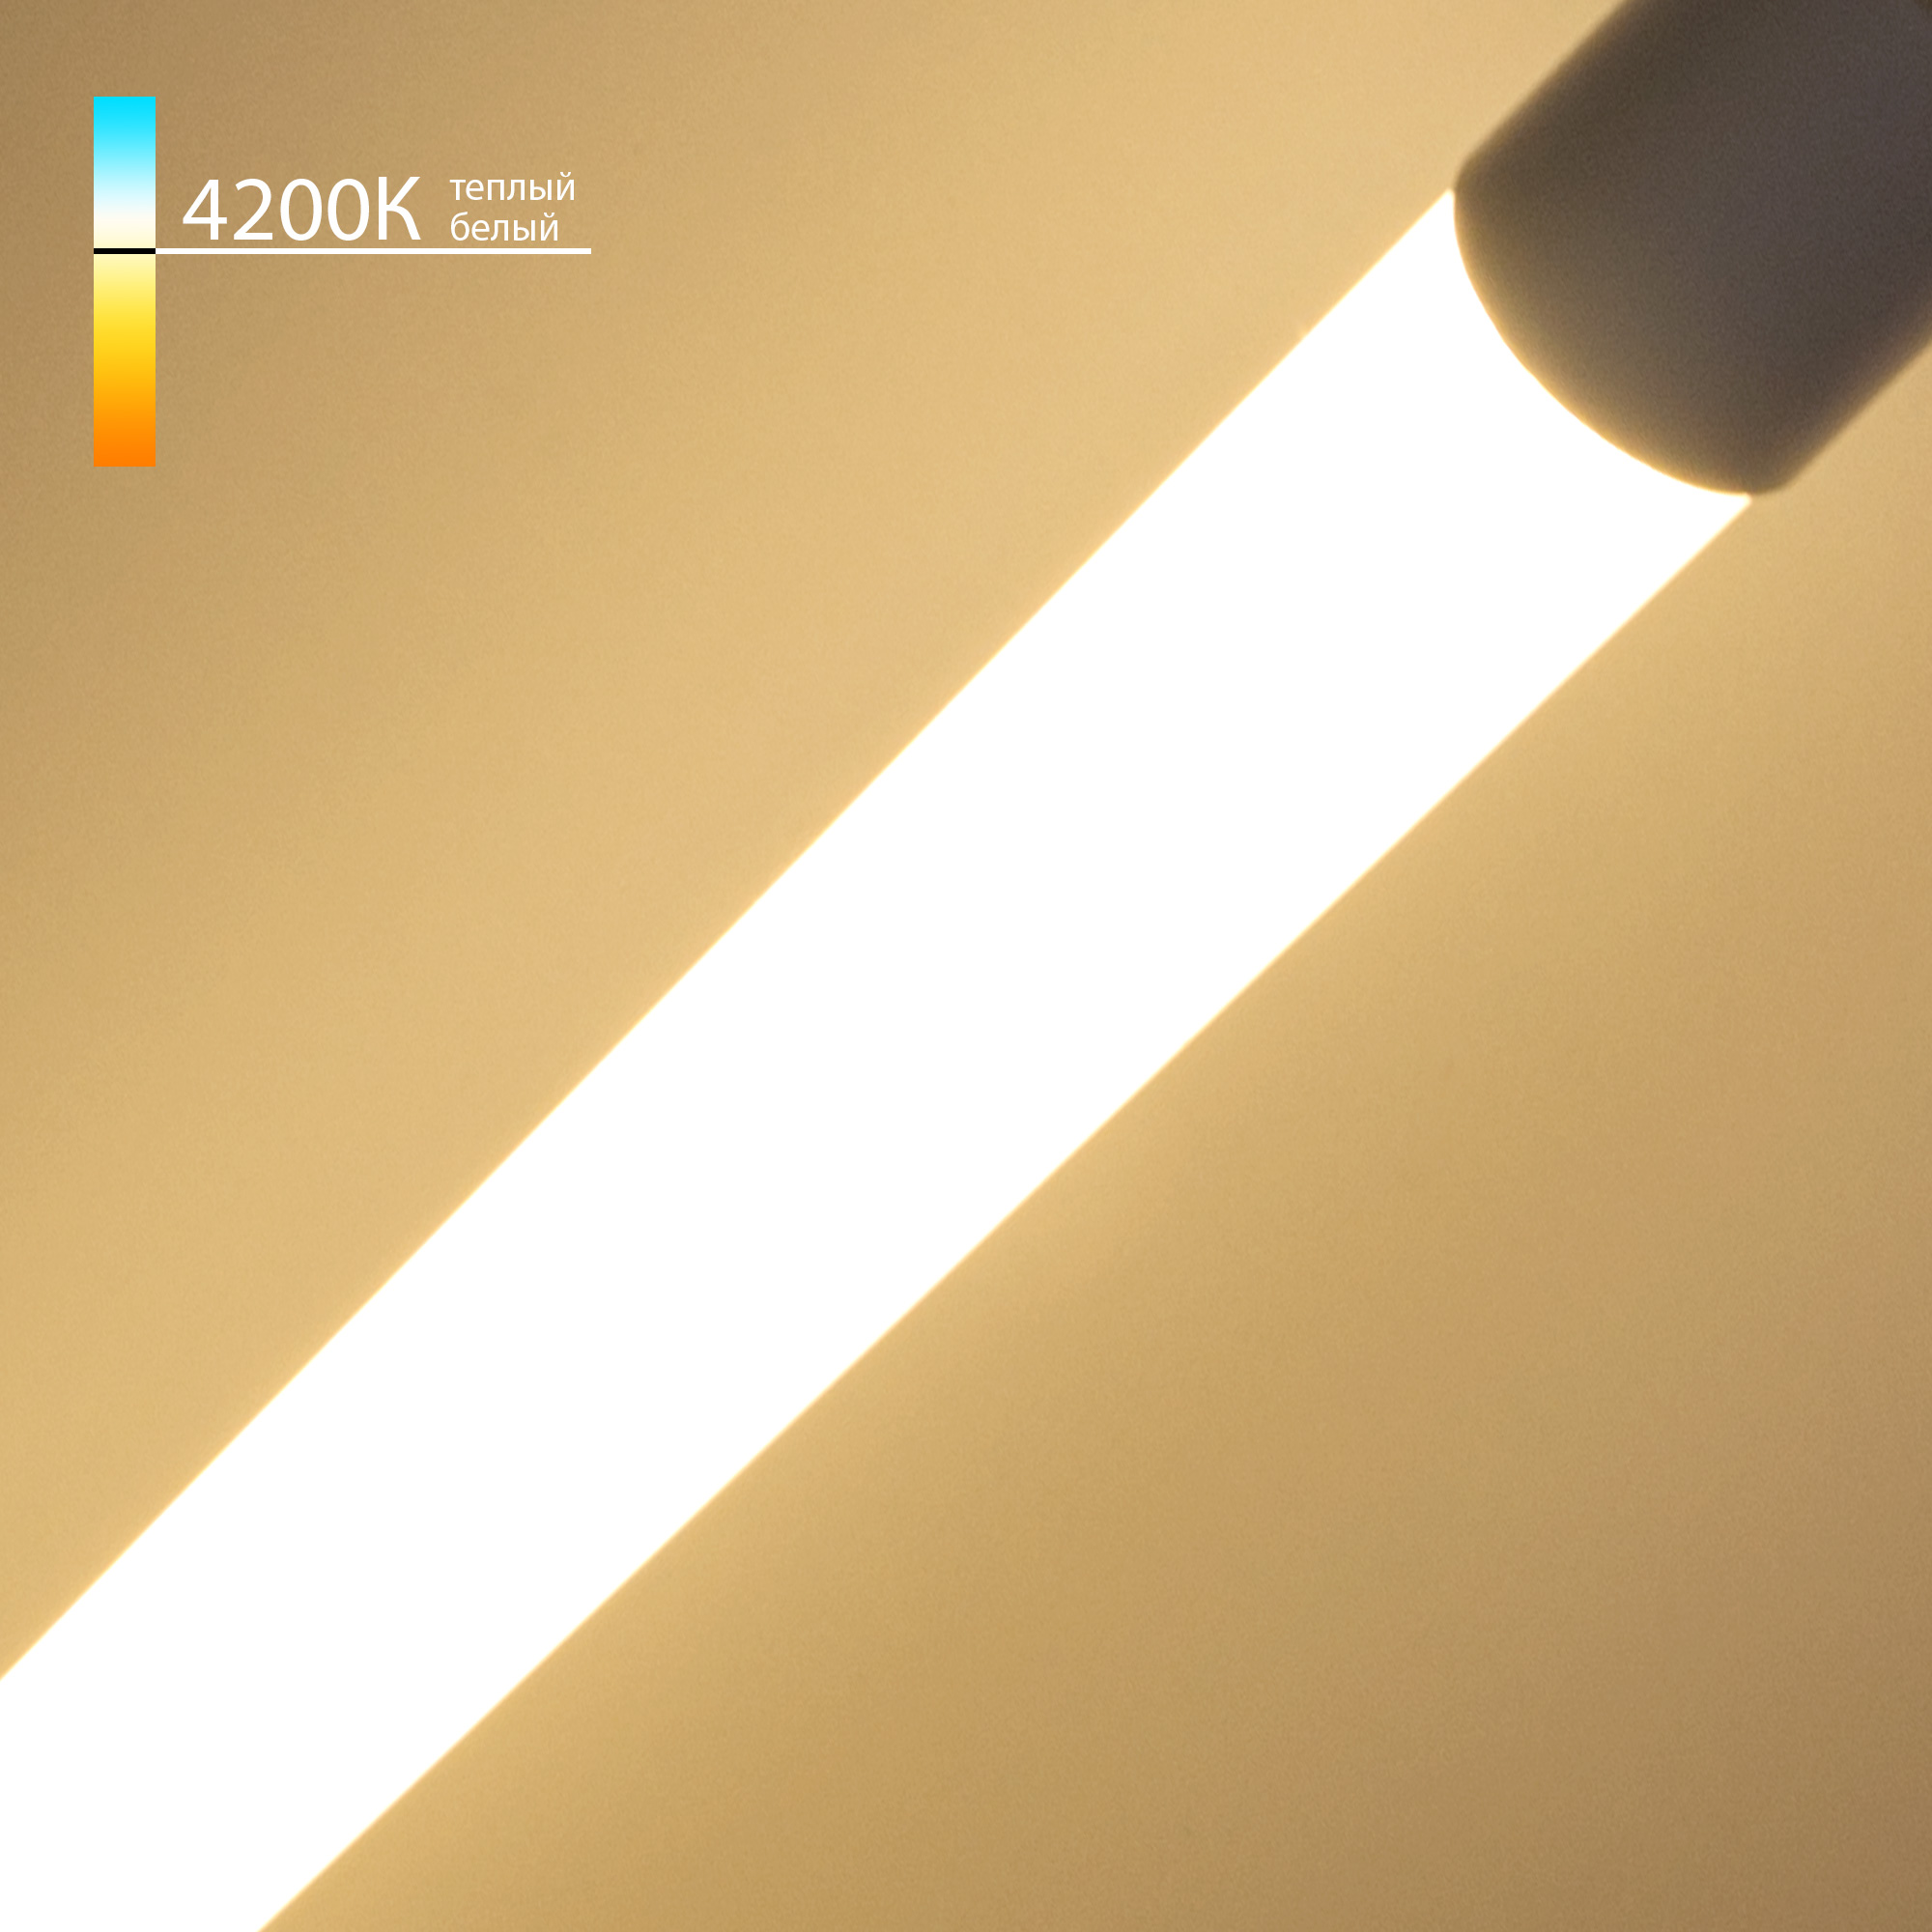 Светодиодная лампа LTG-T8-18W 4200K